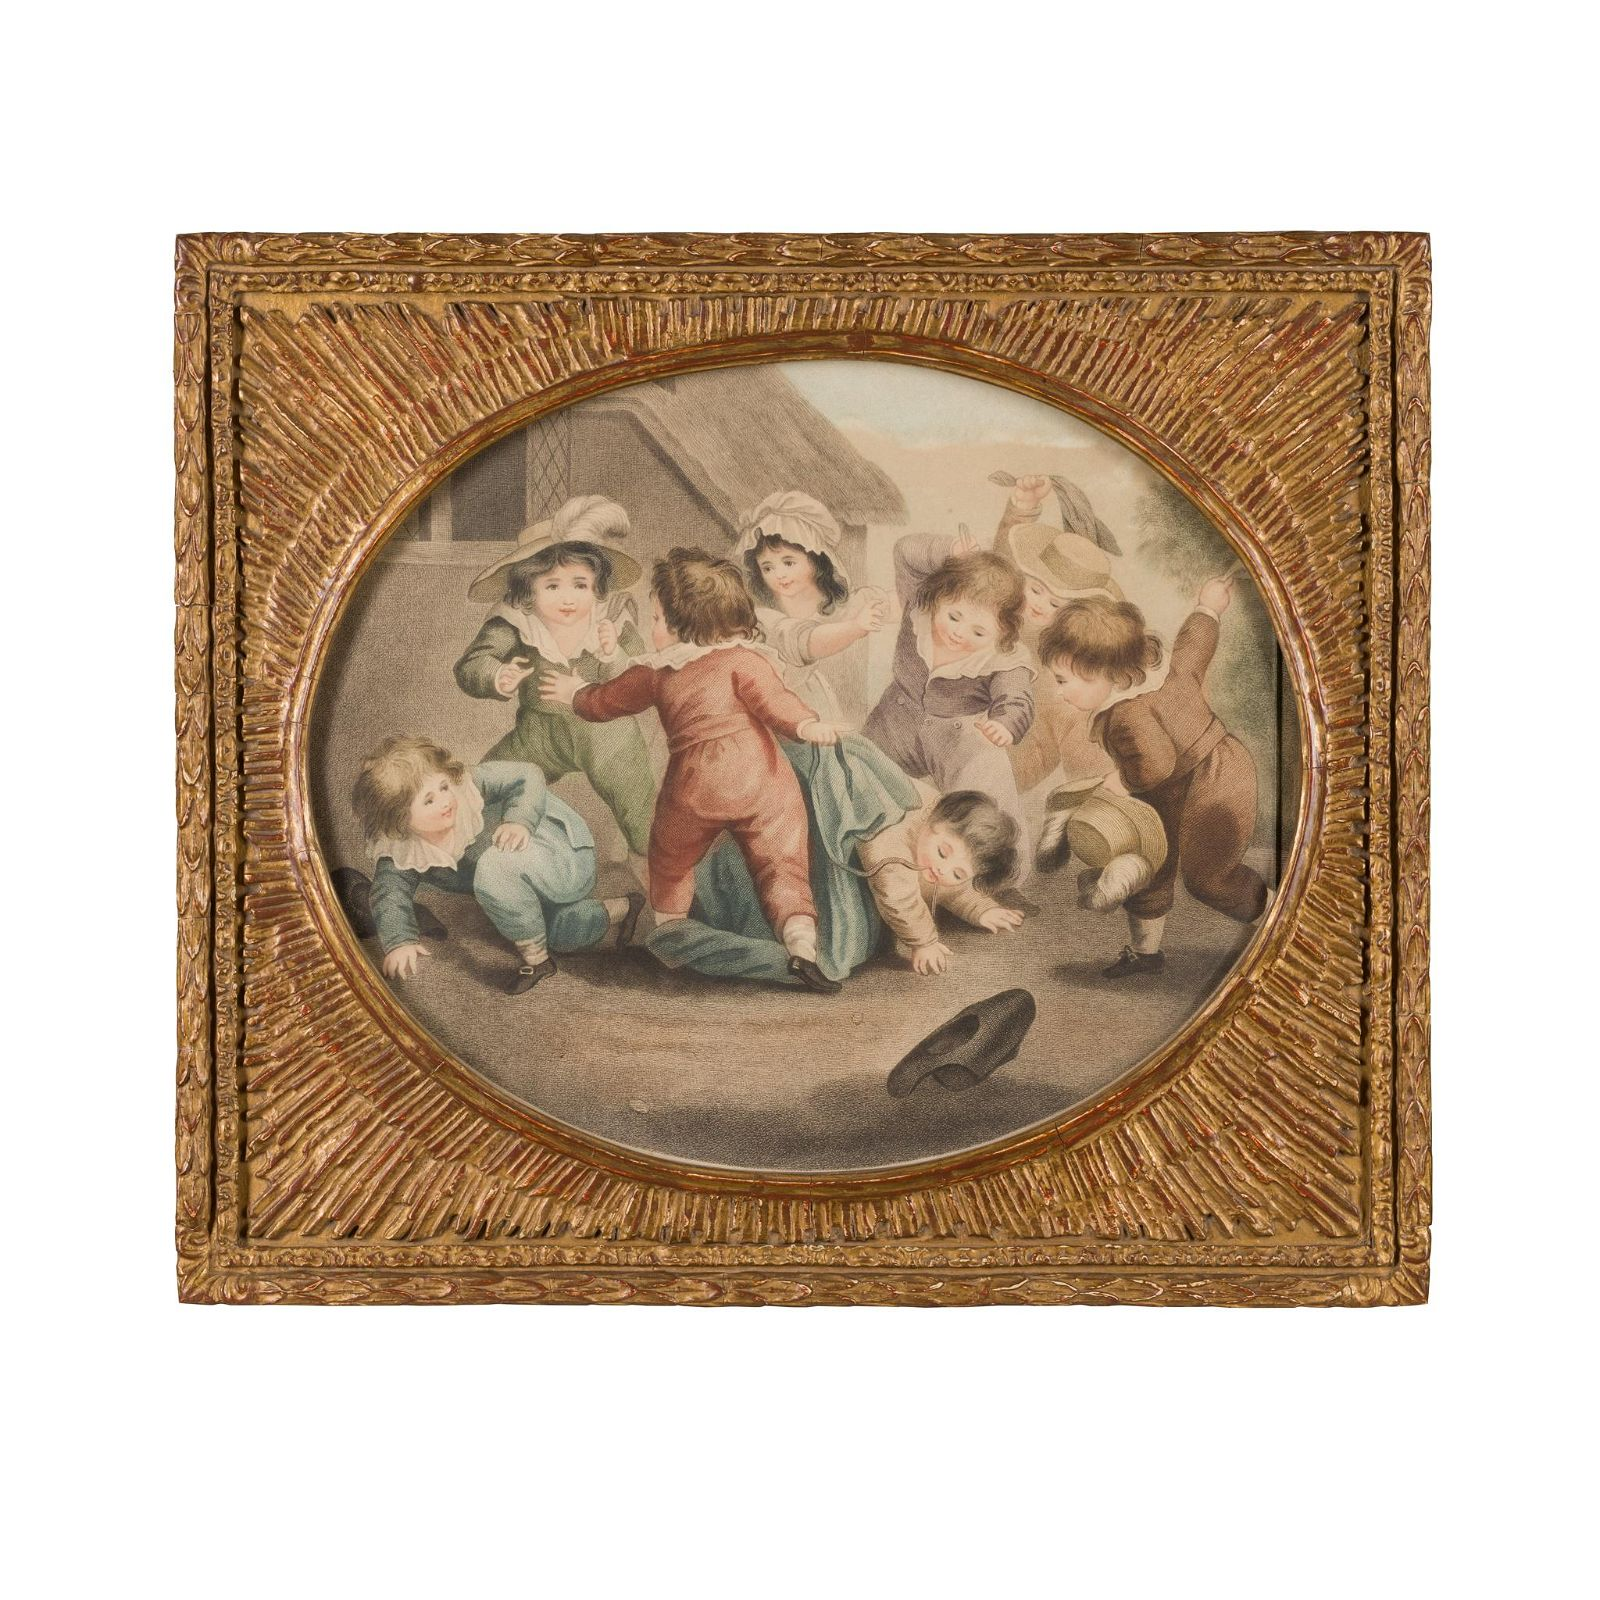 18TH CENTURY ENGLISH SCHOOL CHILDREN AT PLAY